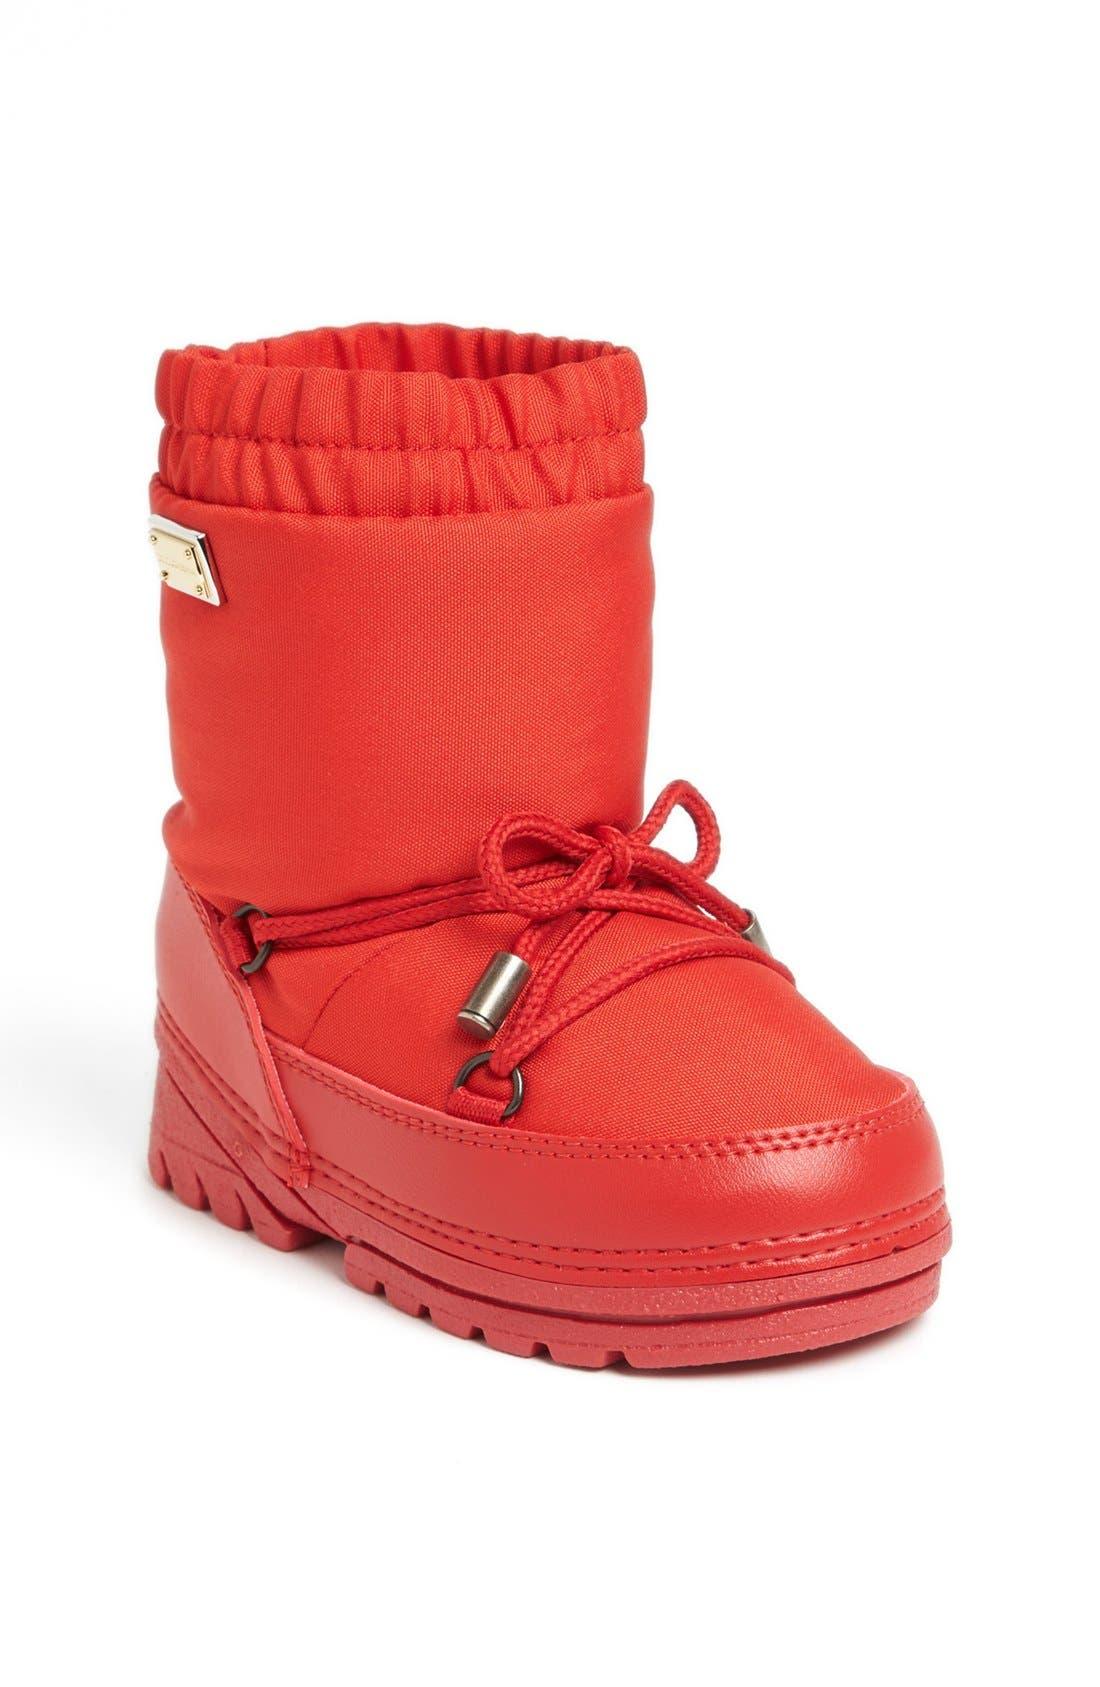 Main Image - Dolce&Gabanna Retro Boot (Walker & Toddler)